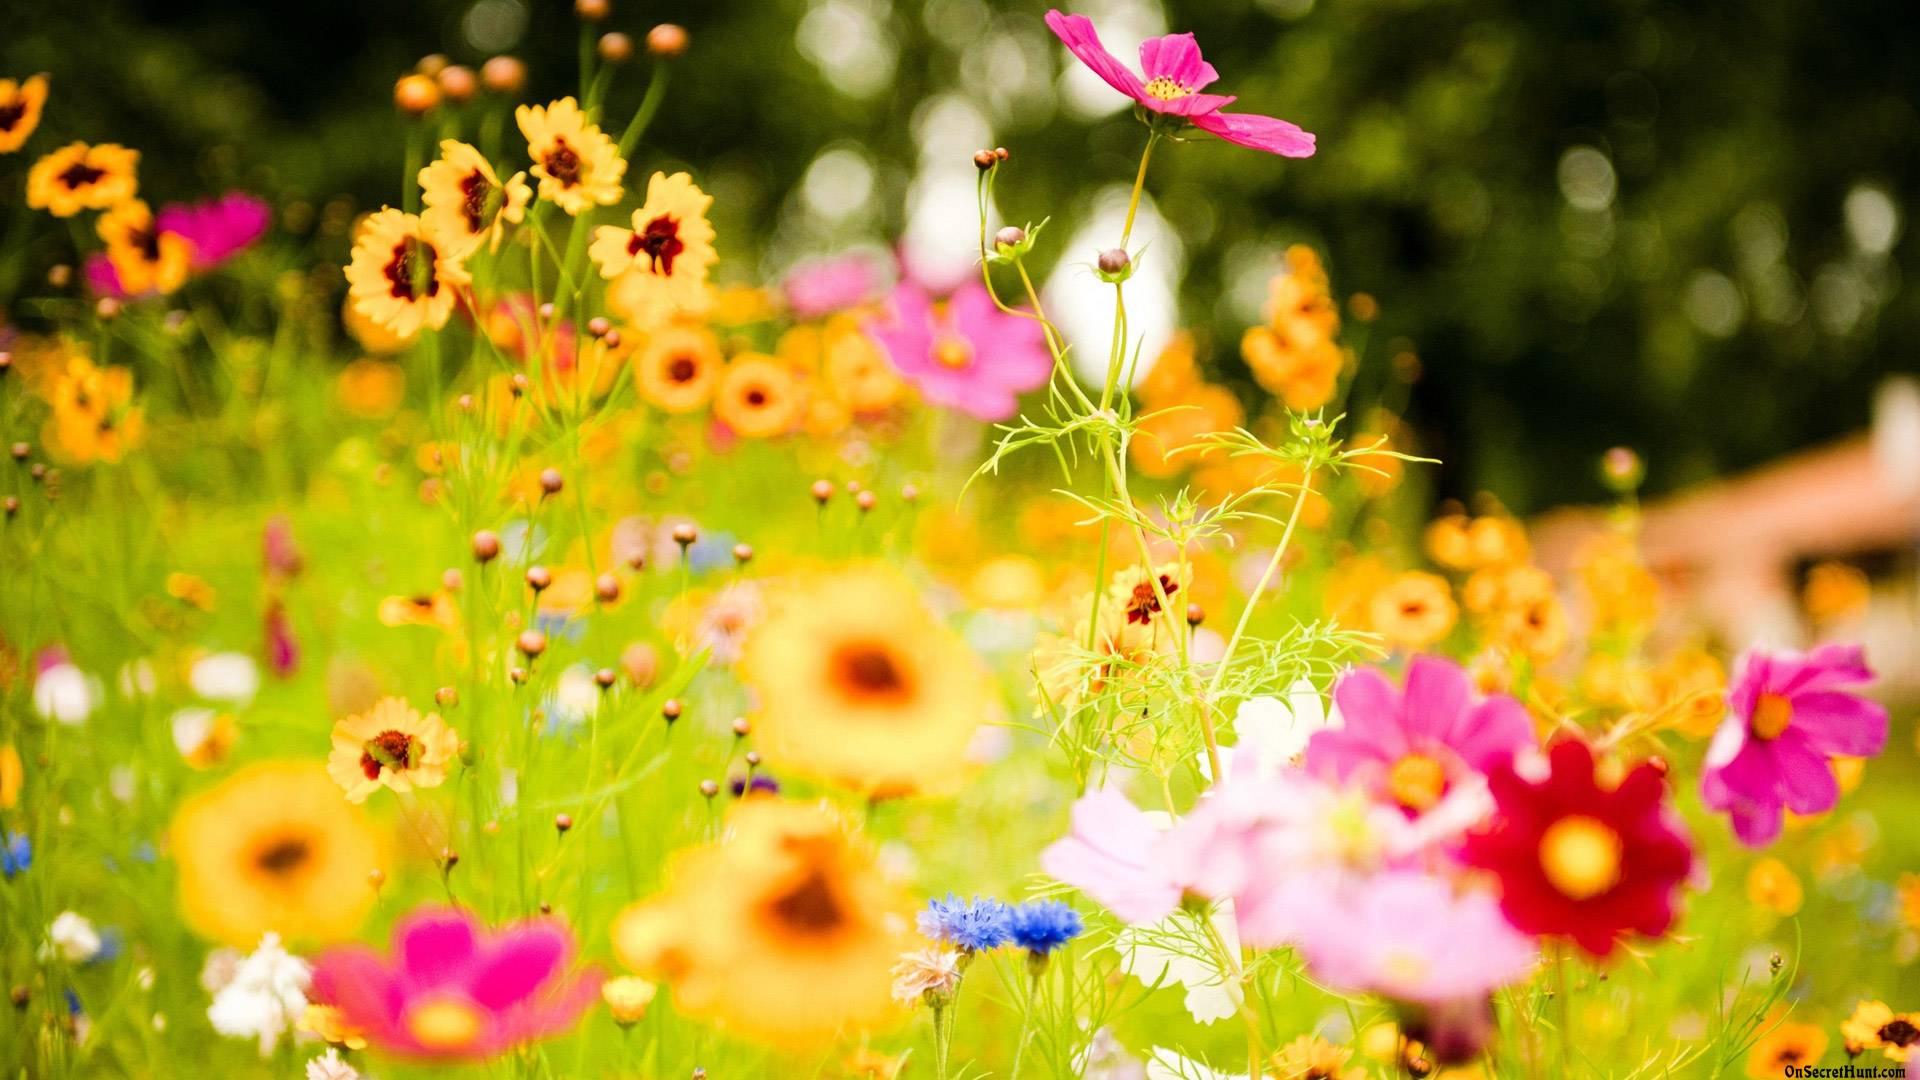 Vivid Flowers 34856 1600x1000 Px Vivid Flowers